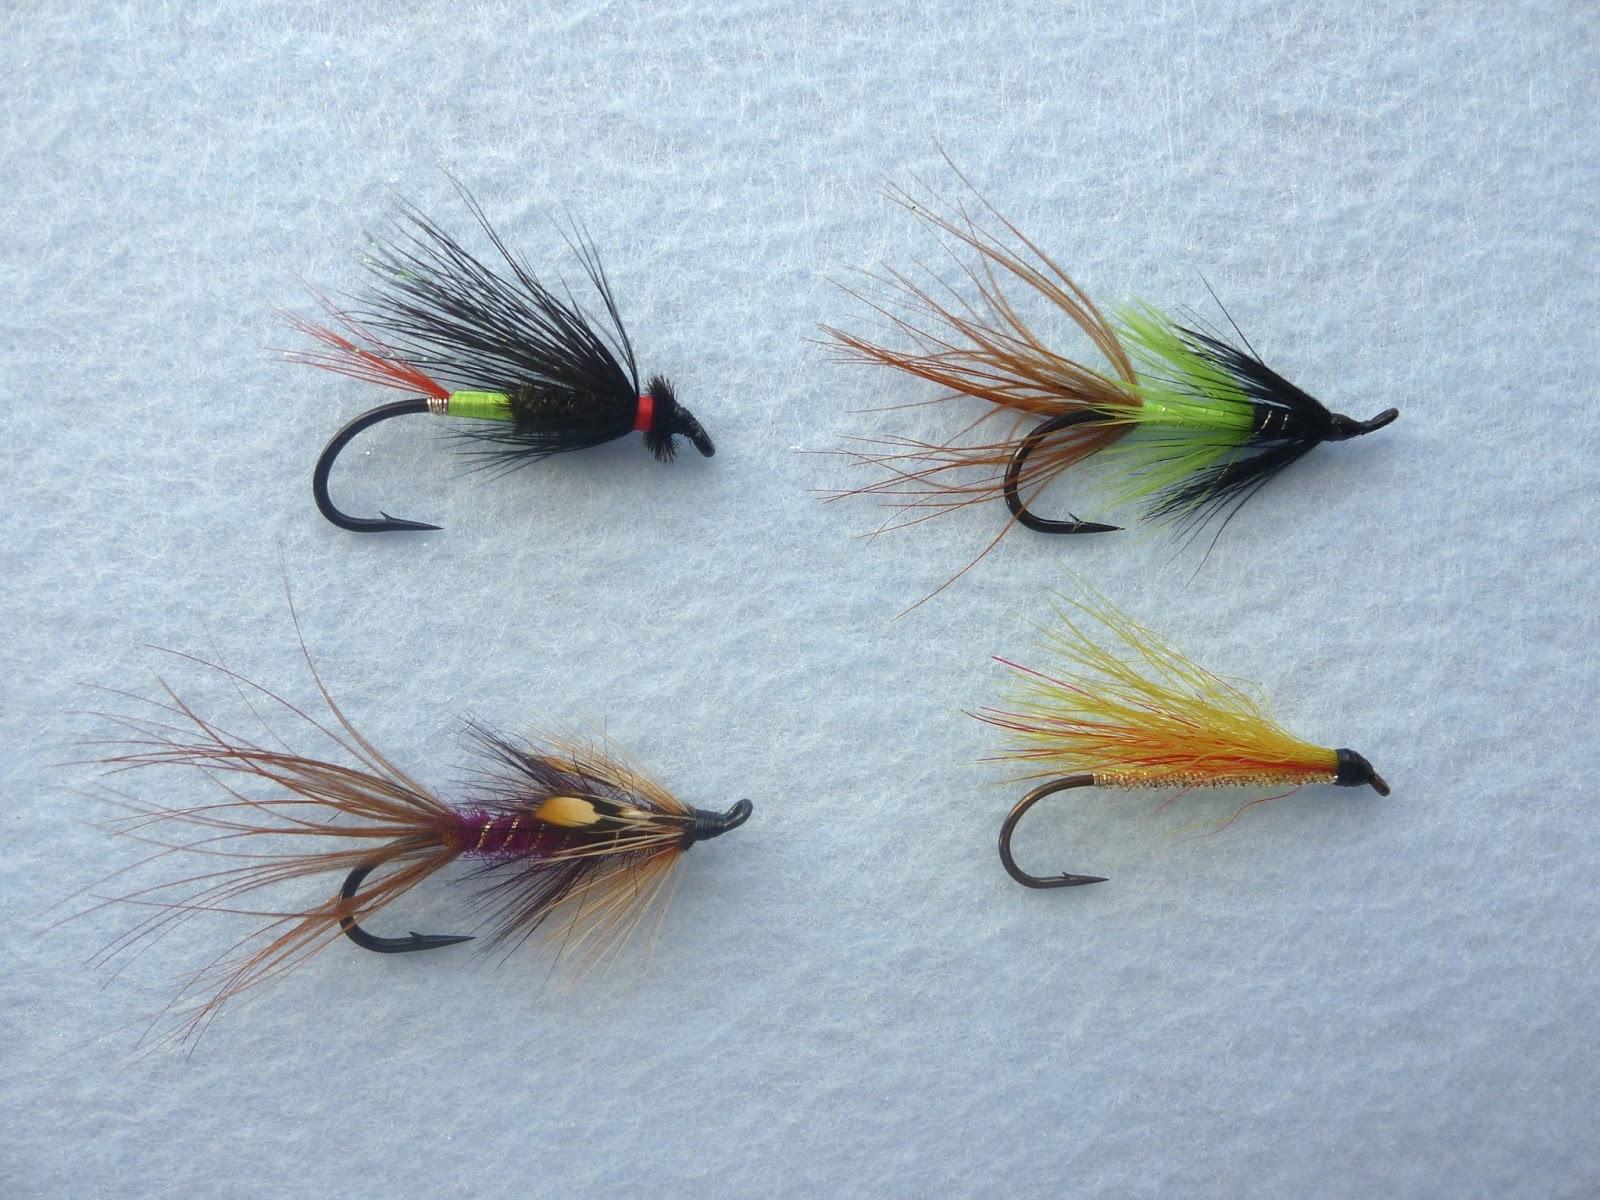 Atlantic salmon flies favorite flies for the naugatuck river for Salon fly